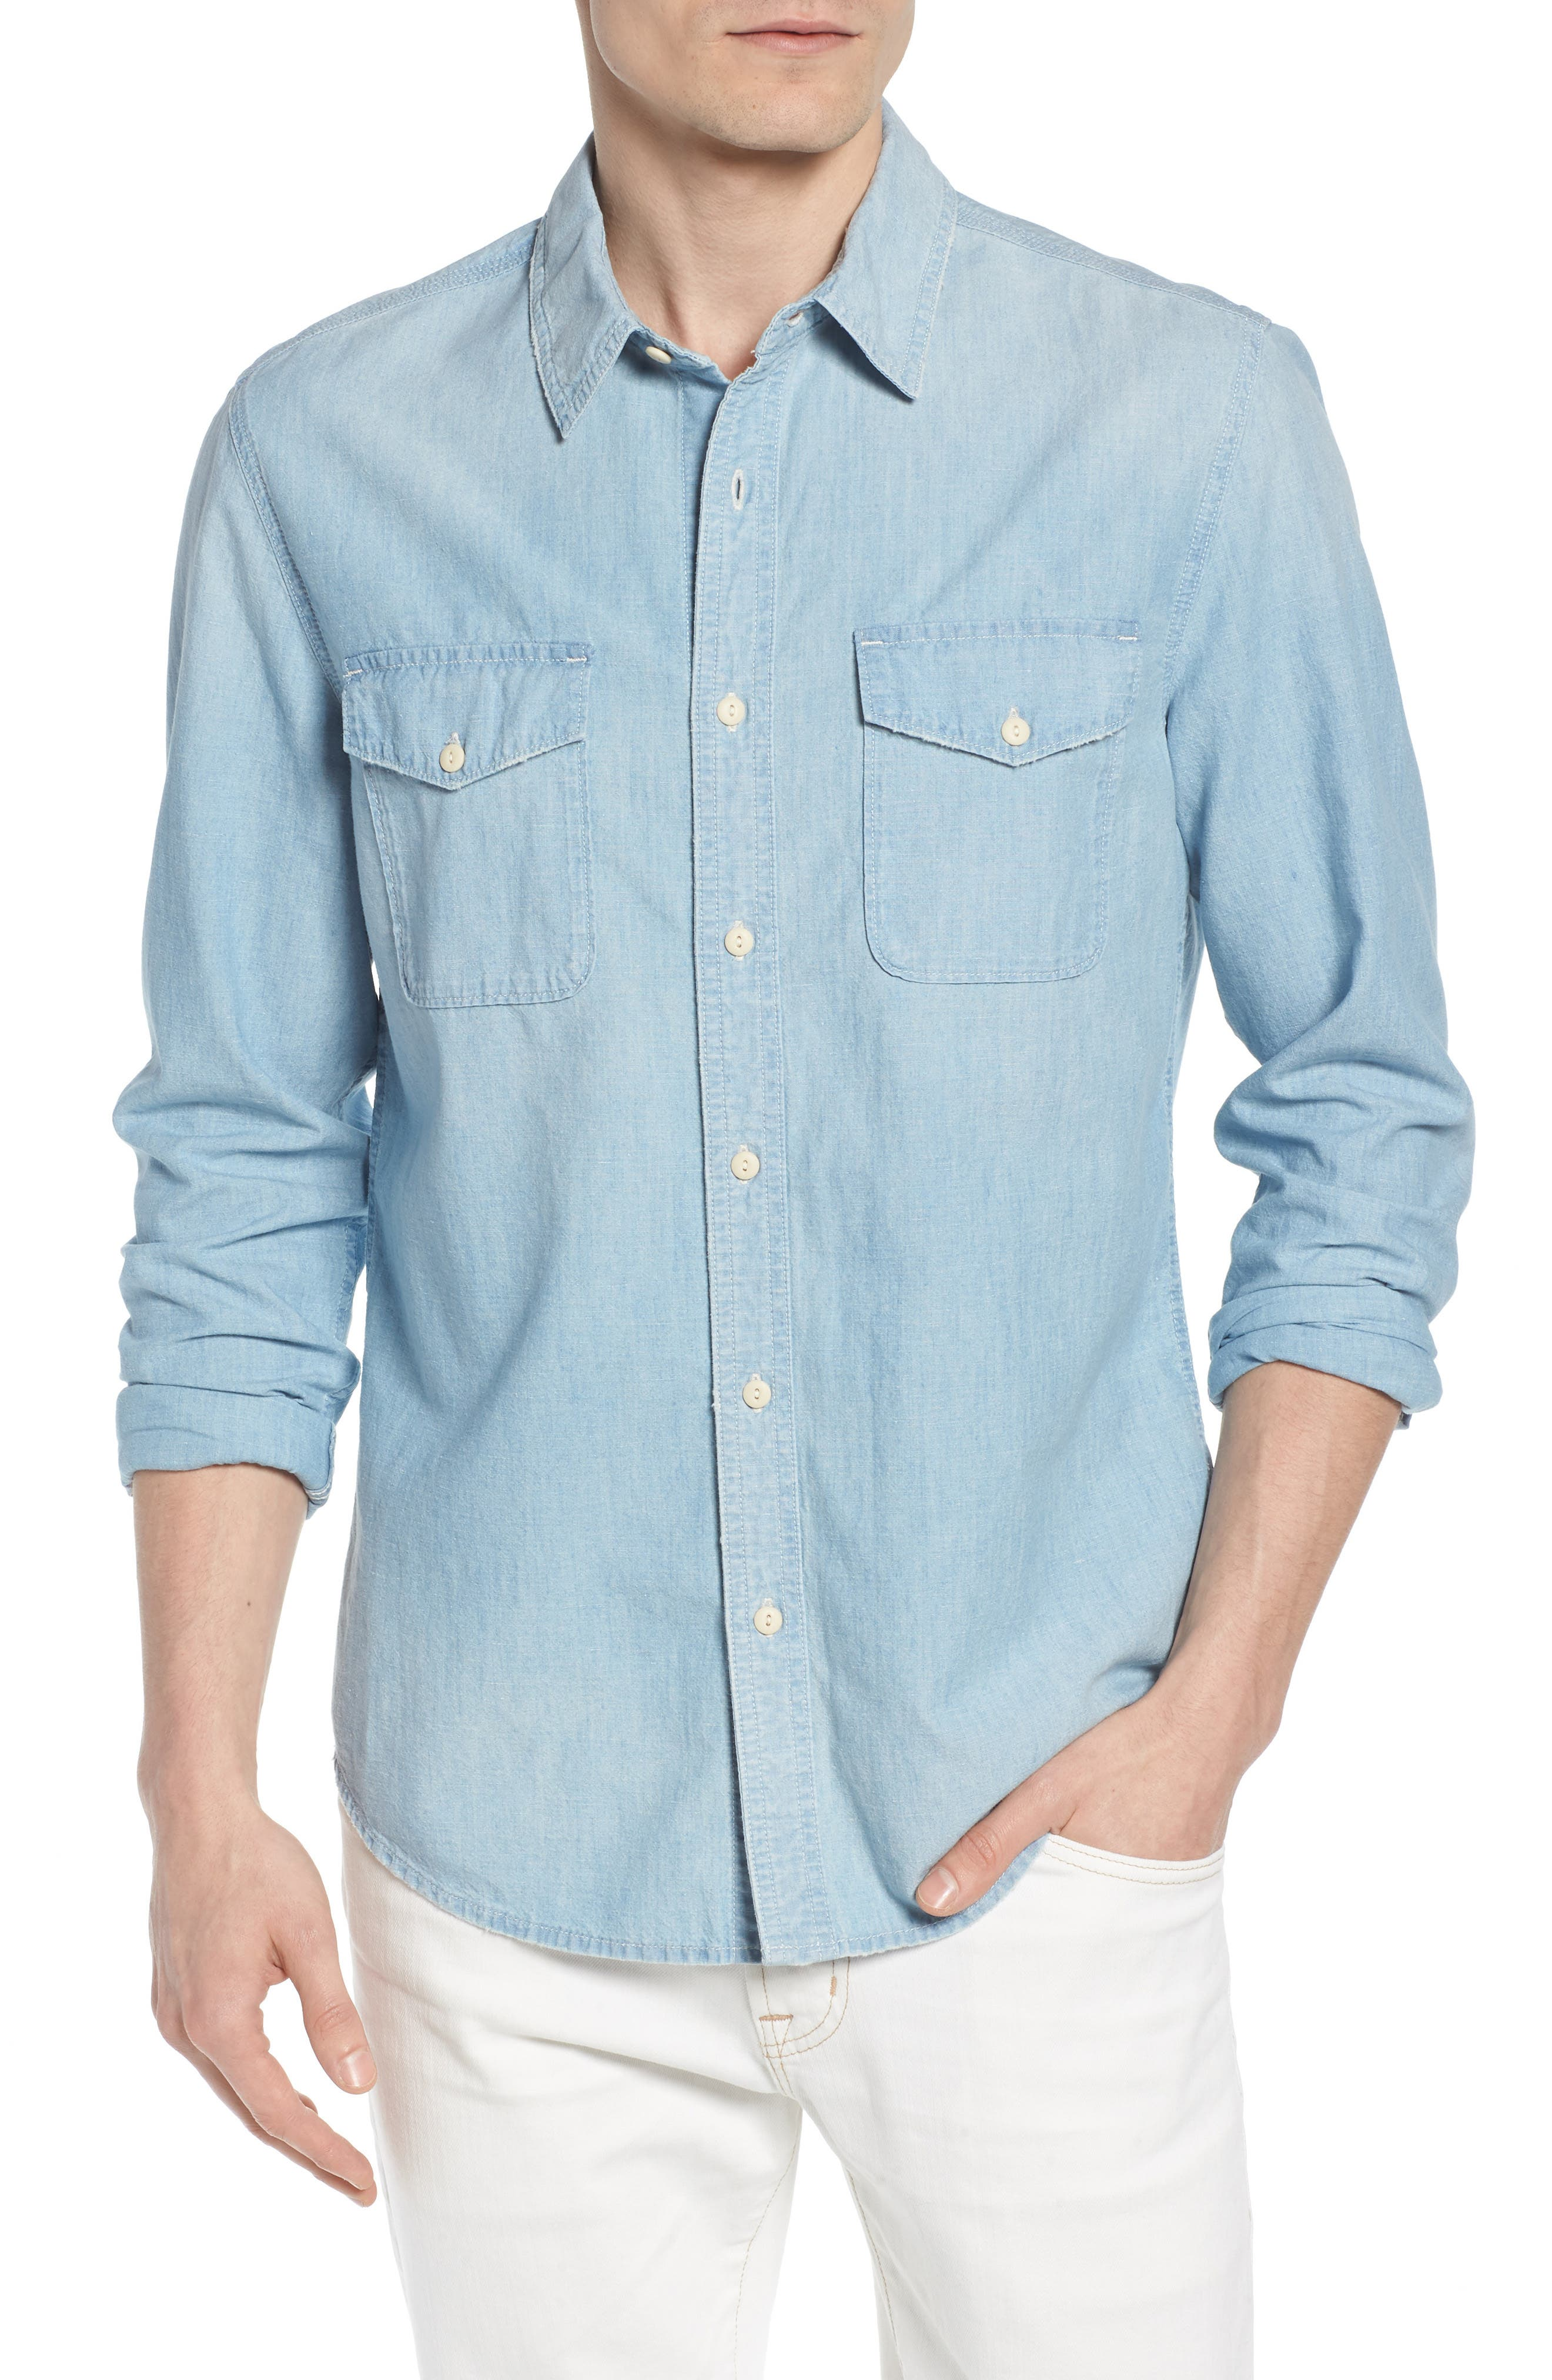 Benning Regular Fit Sport Shirt,                         Main,                         color, 499